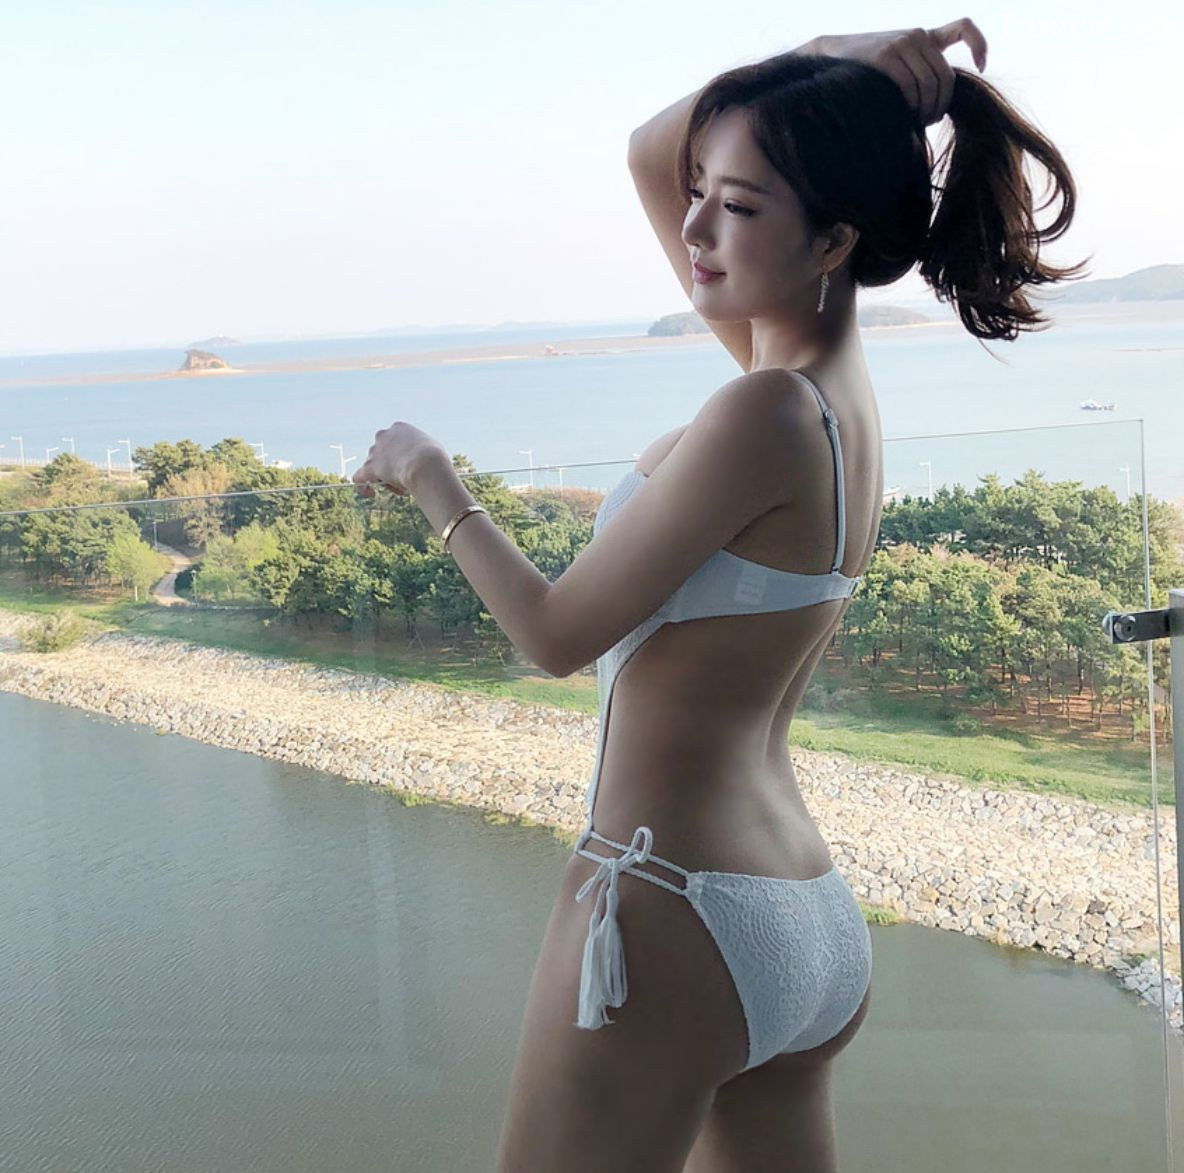 Image Korean Fashion Model - Kang Eun Wook - White Apple Swimsuit - TruePic.net - Picture-1